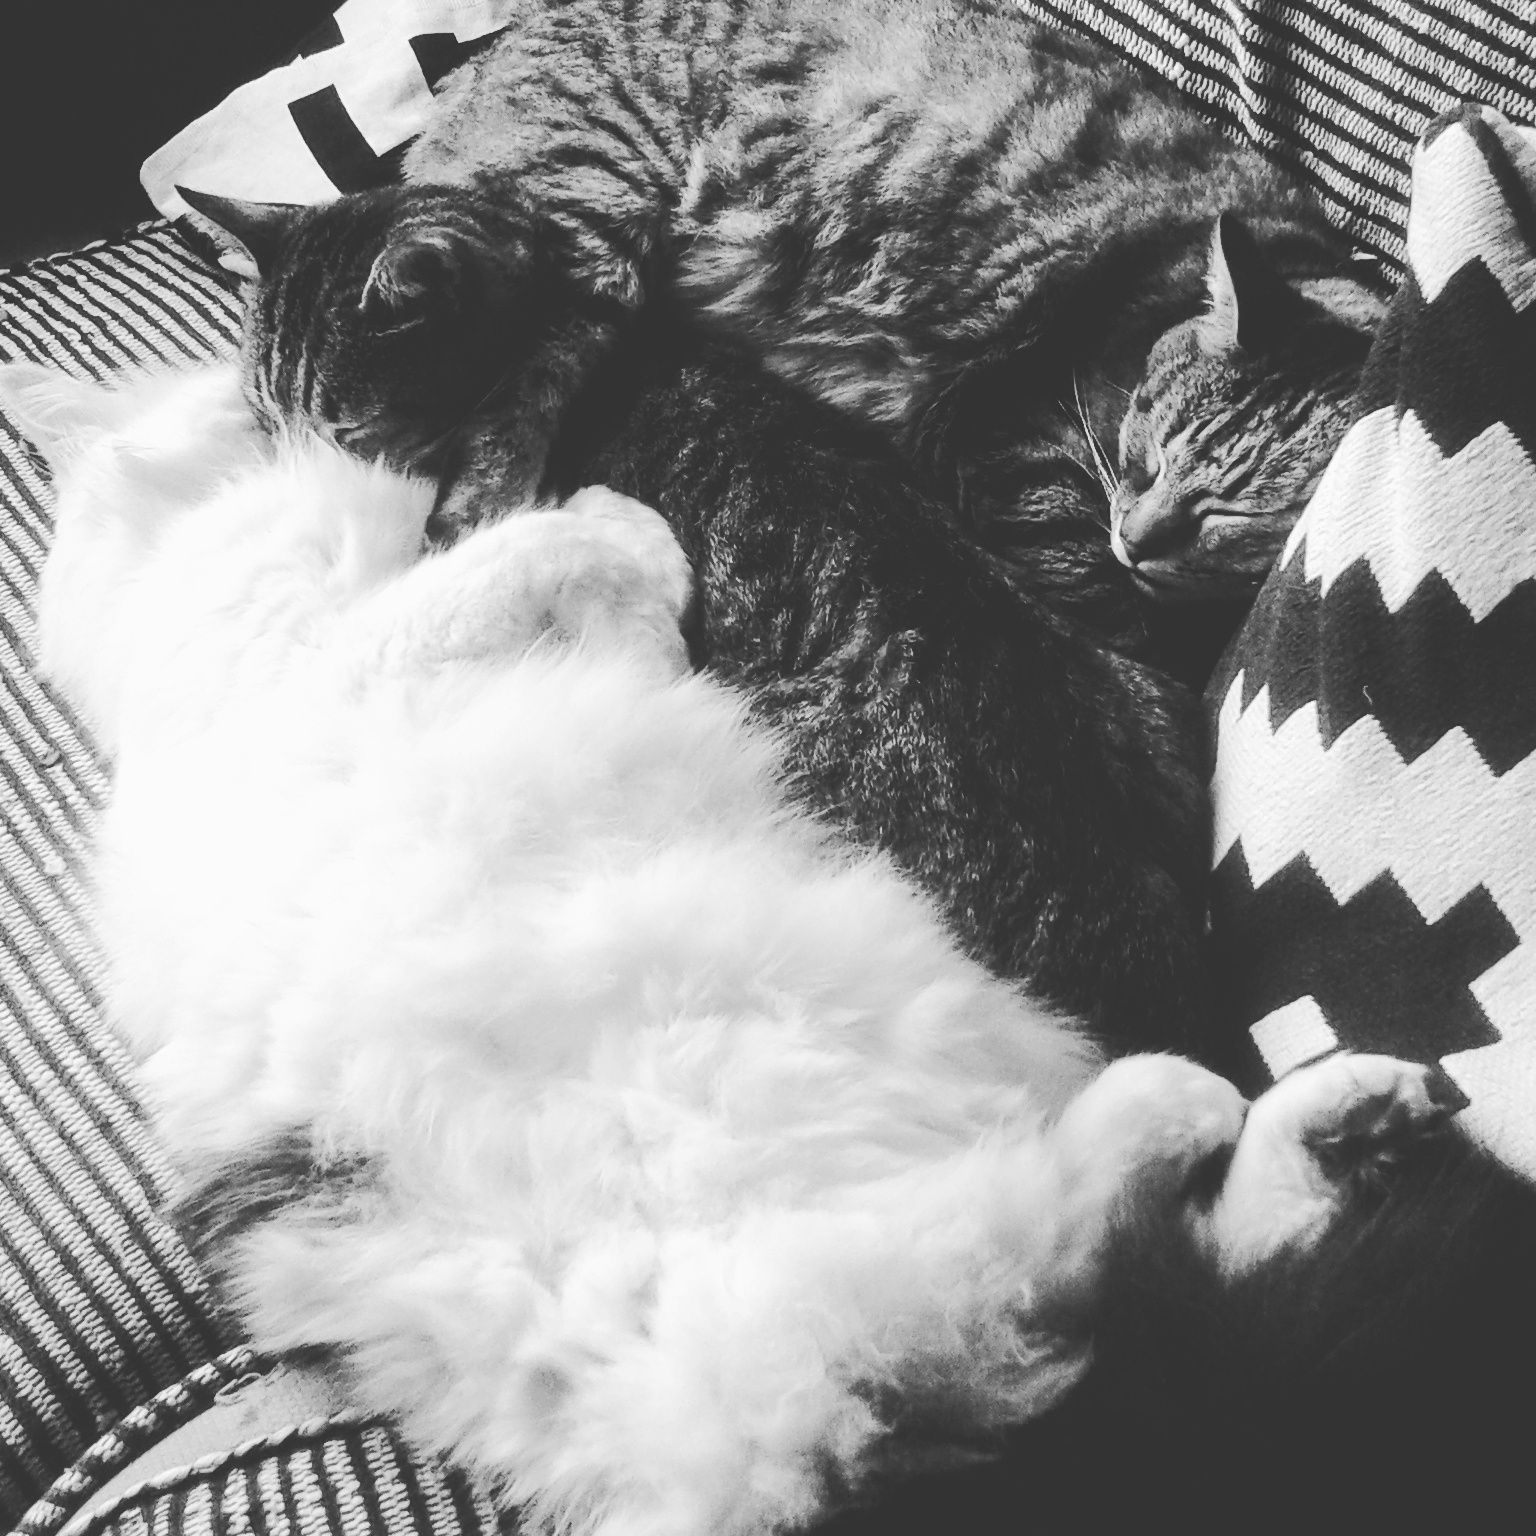 Sieste de chats